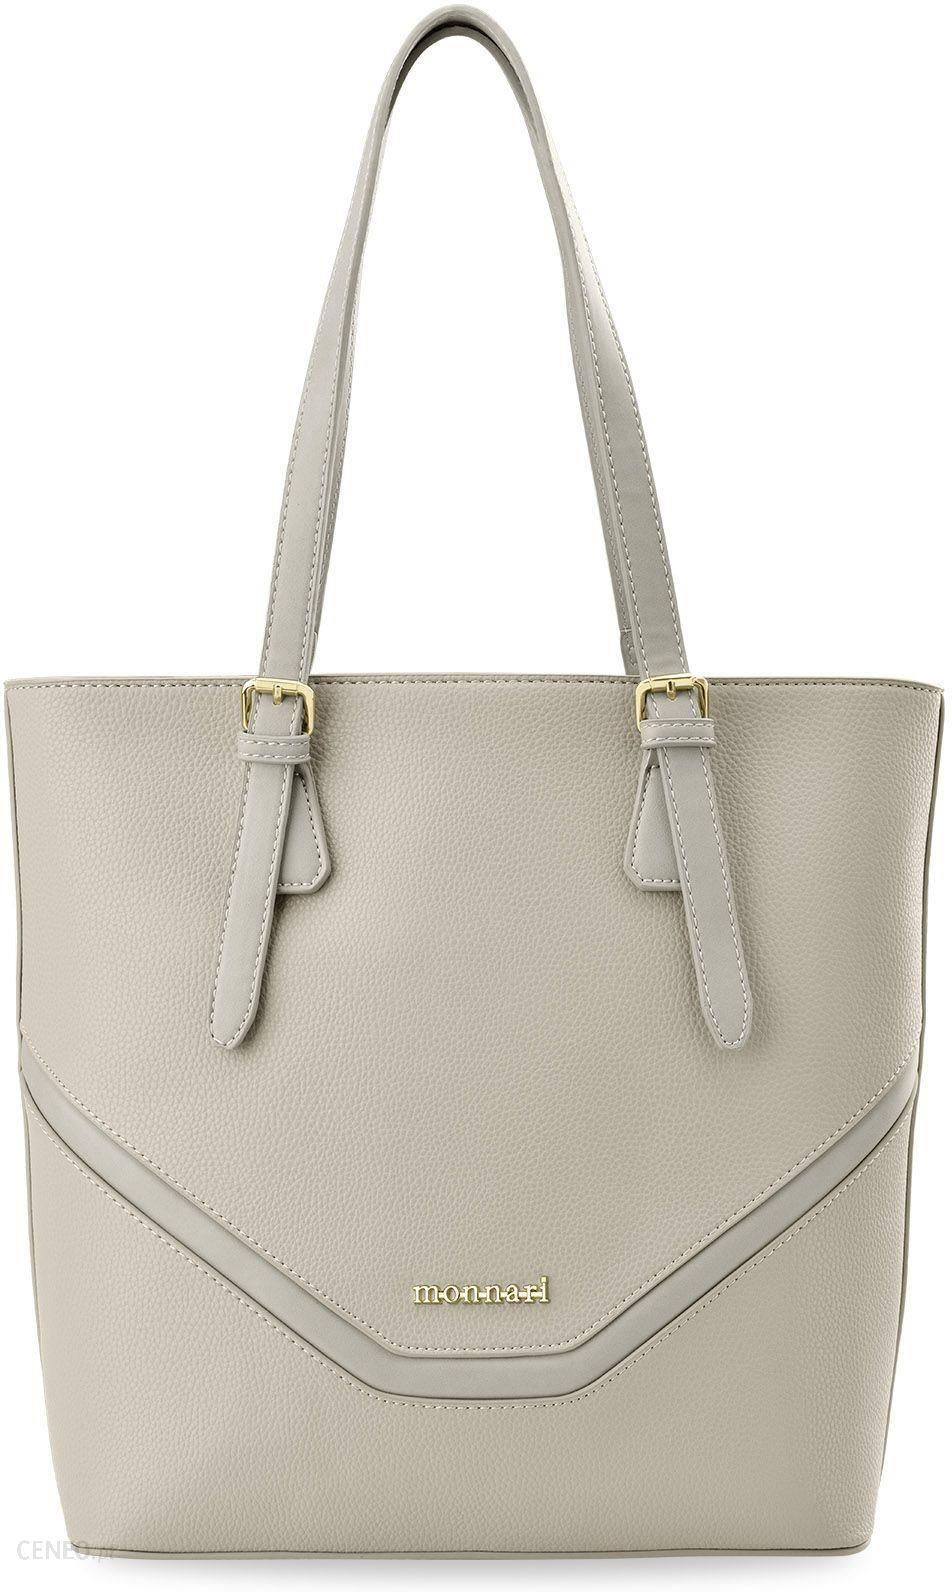 c556a7e20eed1 Shopperka monnari elegancka duża torebka damska zarka – beżowy - zdjęcie 1